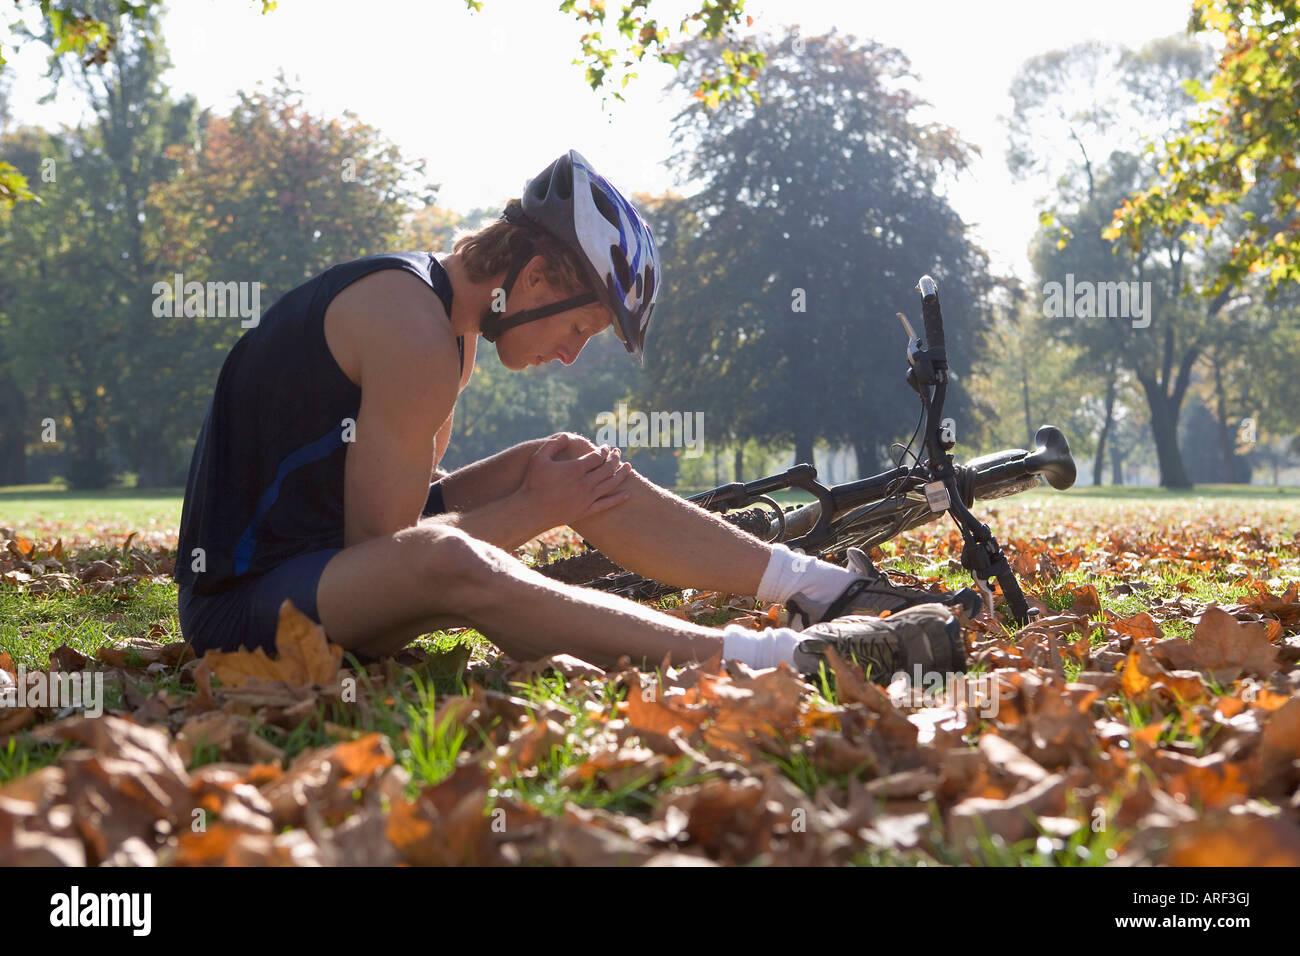 Cyclists looking at injury - Stock Image